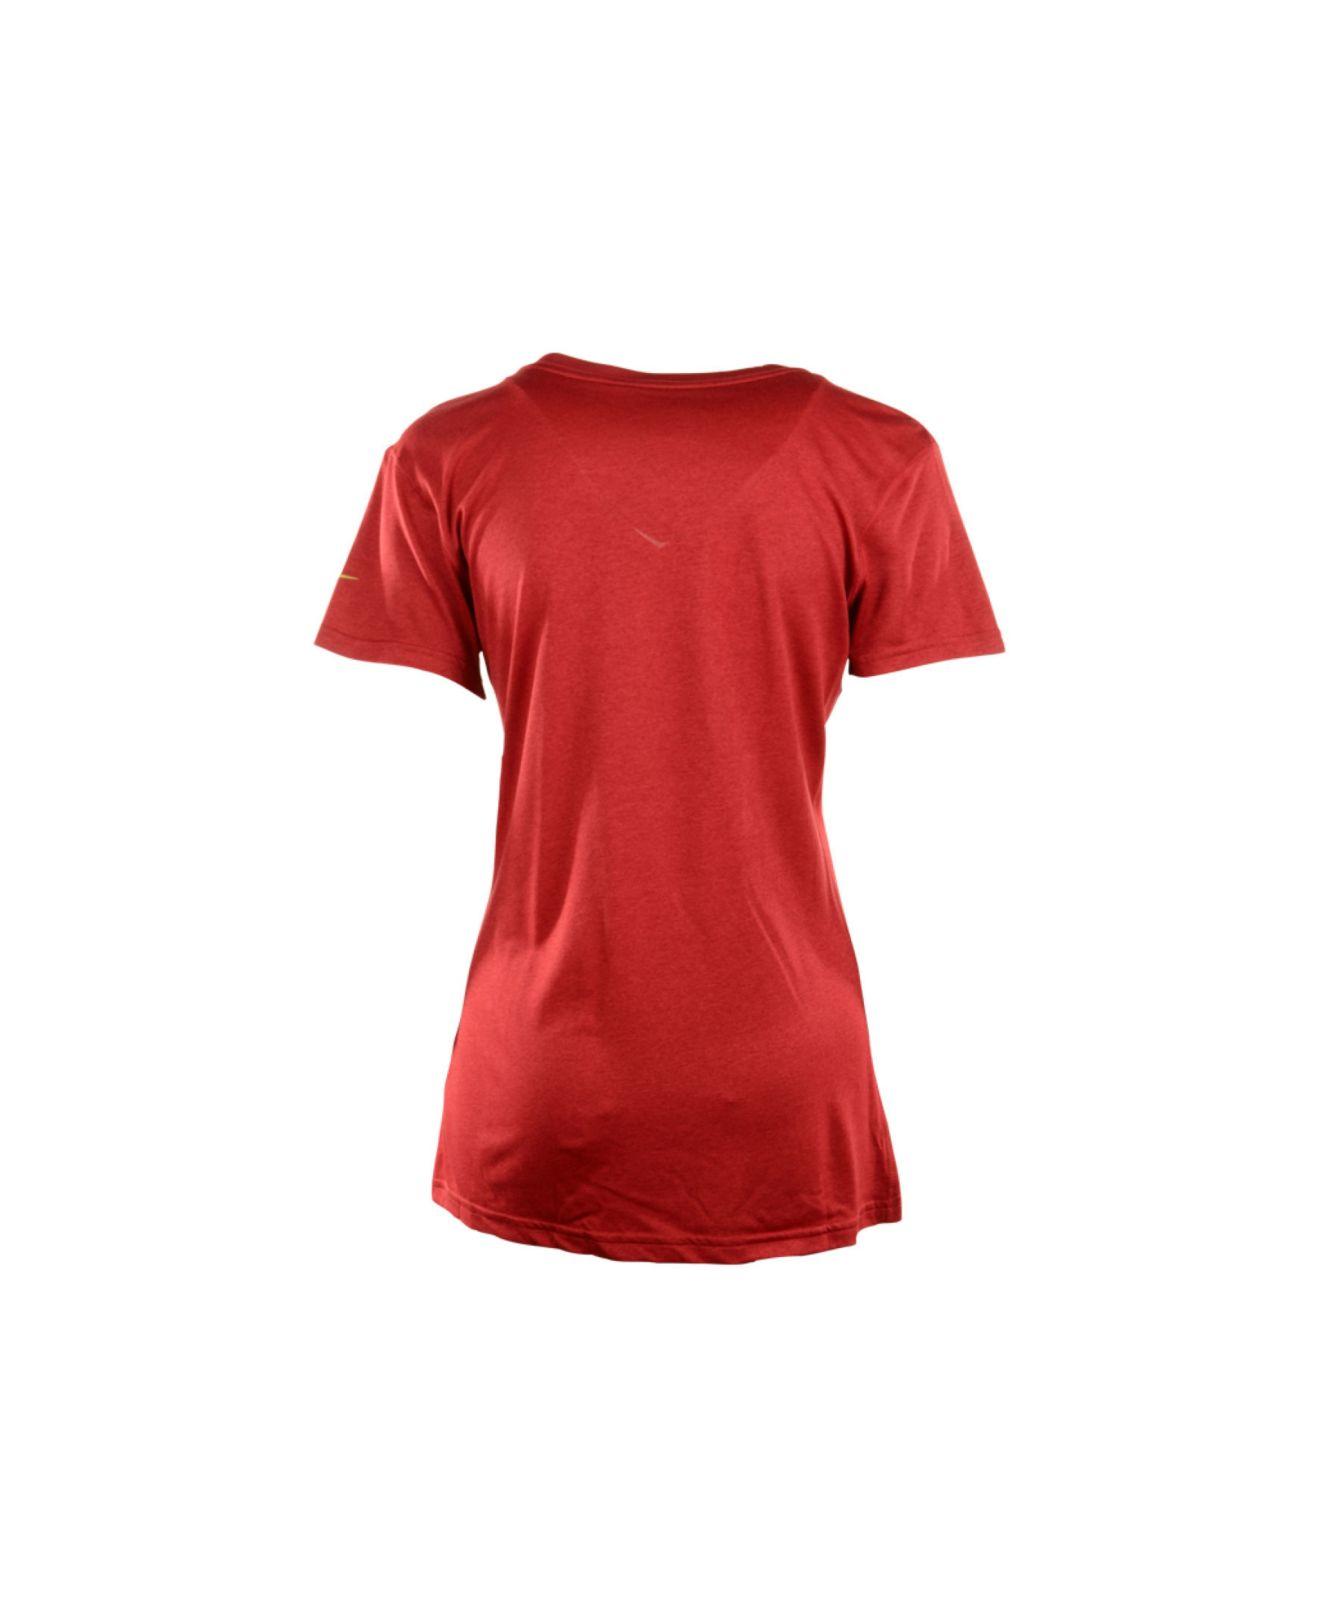 Lyst - Nike Women s Short-sleeve San Francisco 49ers V-neck T-shirt ... 5c16cc831